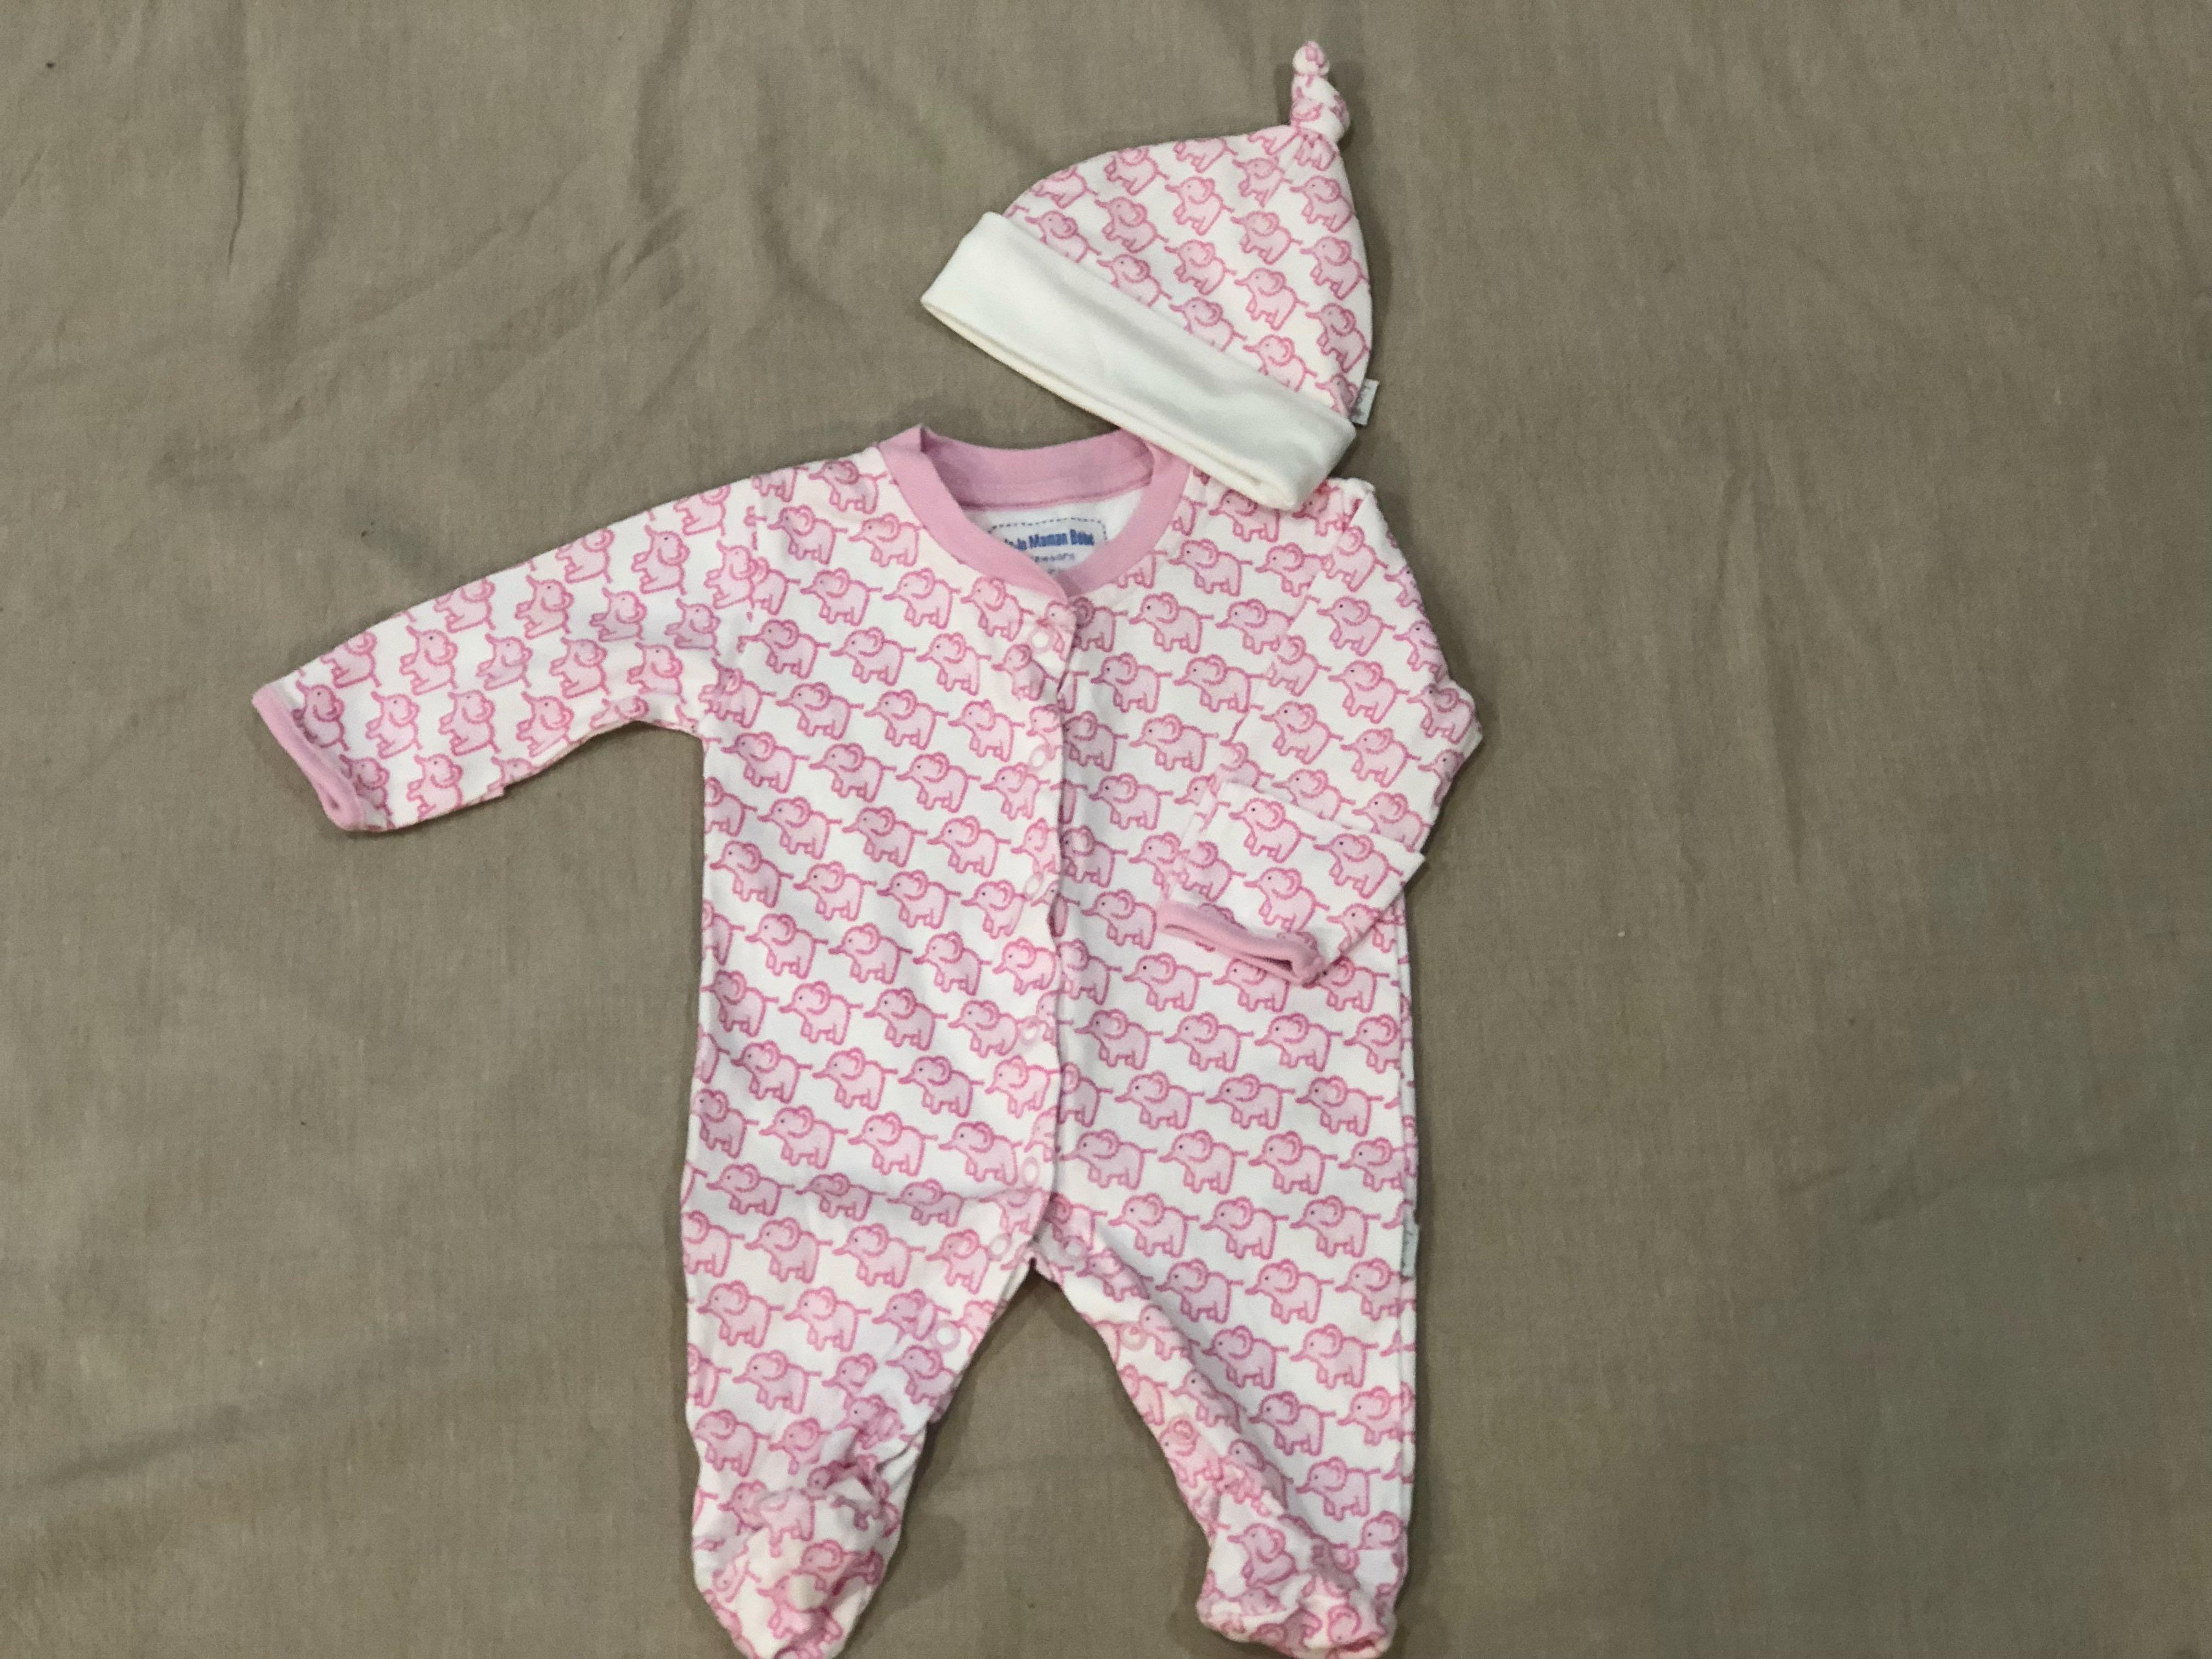 Jojo Maman Bébé | body suit and matching hat| newborn